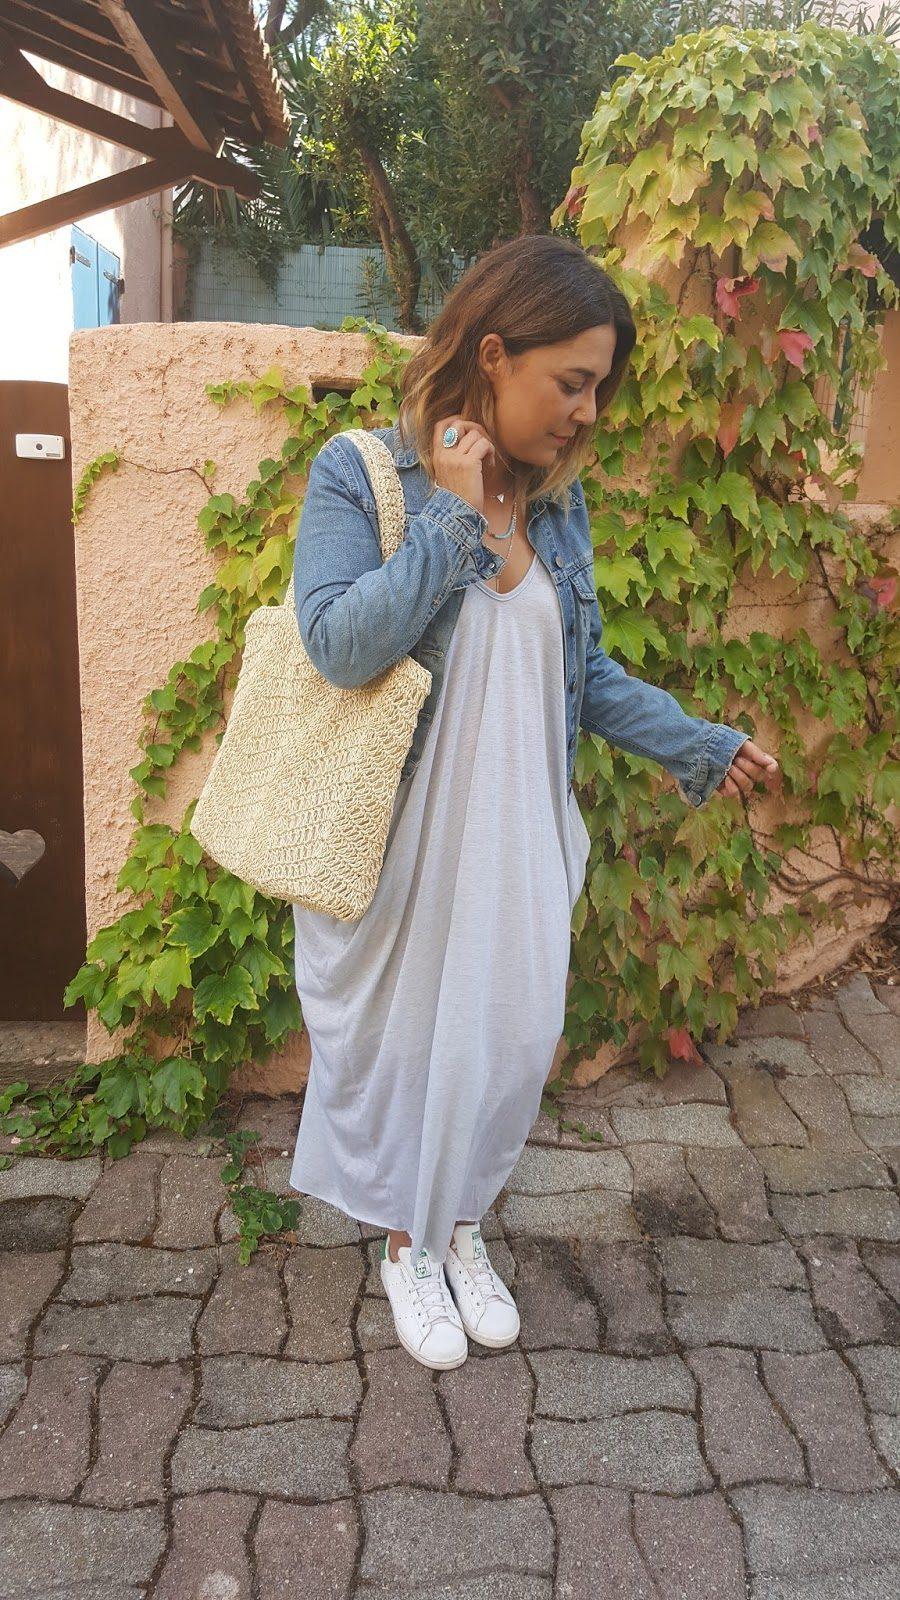 http://chantier.allee-du-foulard.fr/wp-content/uploads/2017/09/Siennalou-sac-pizco-Allee-du-foulard-1-900x1600.jpg